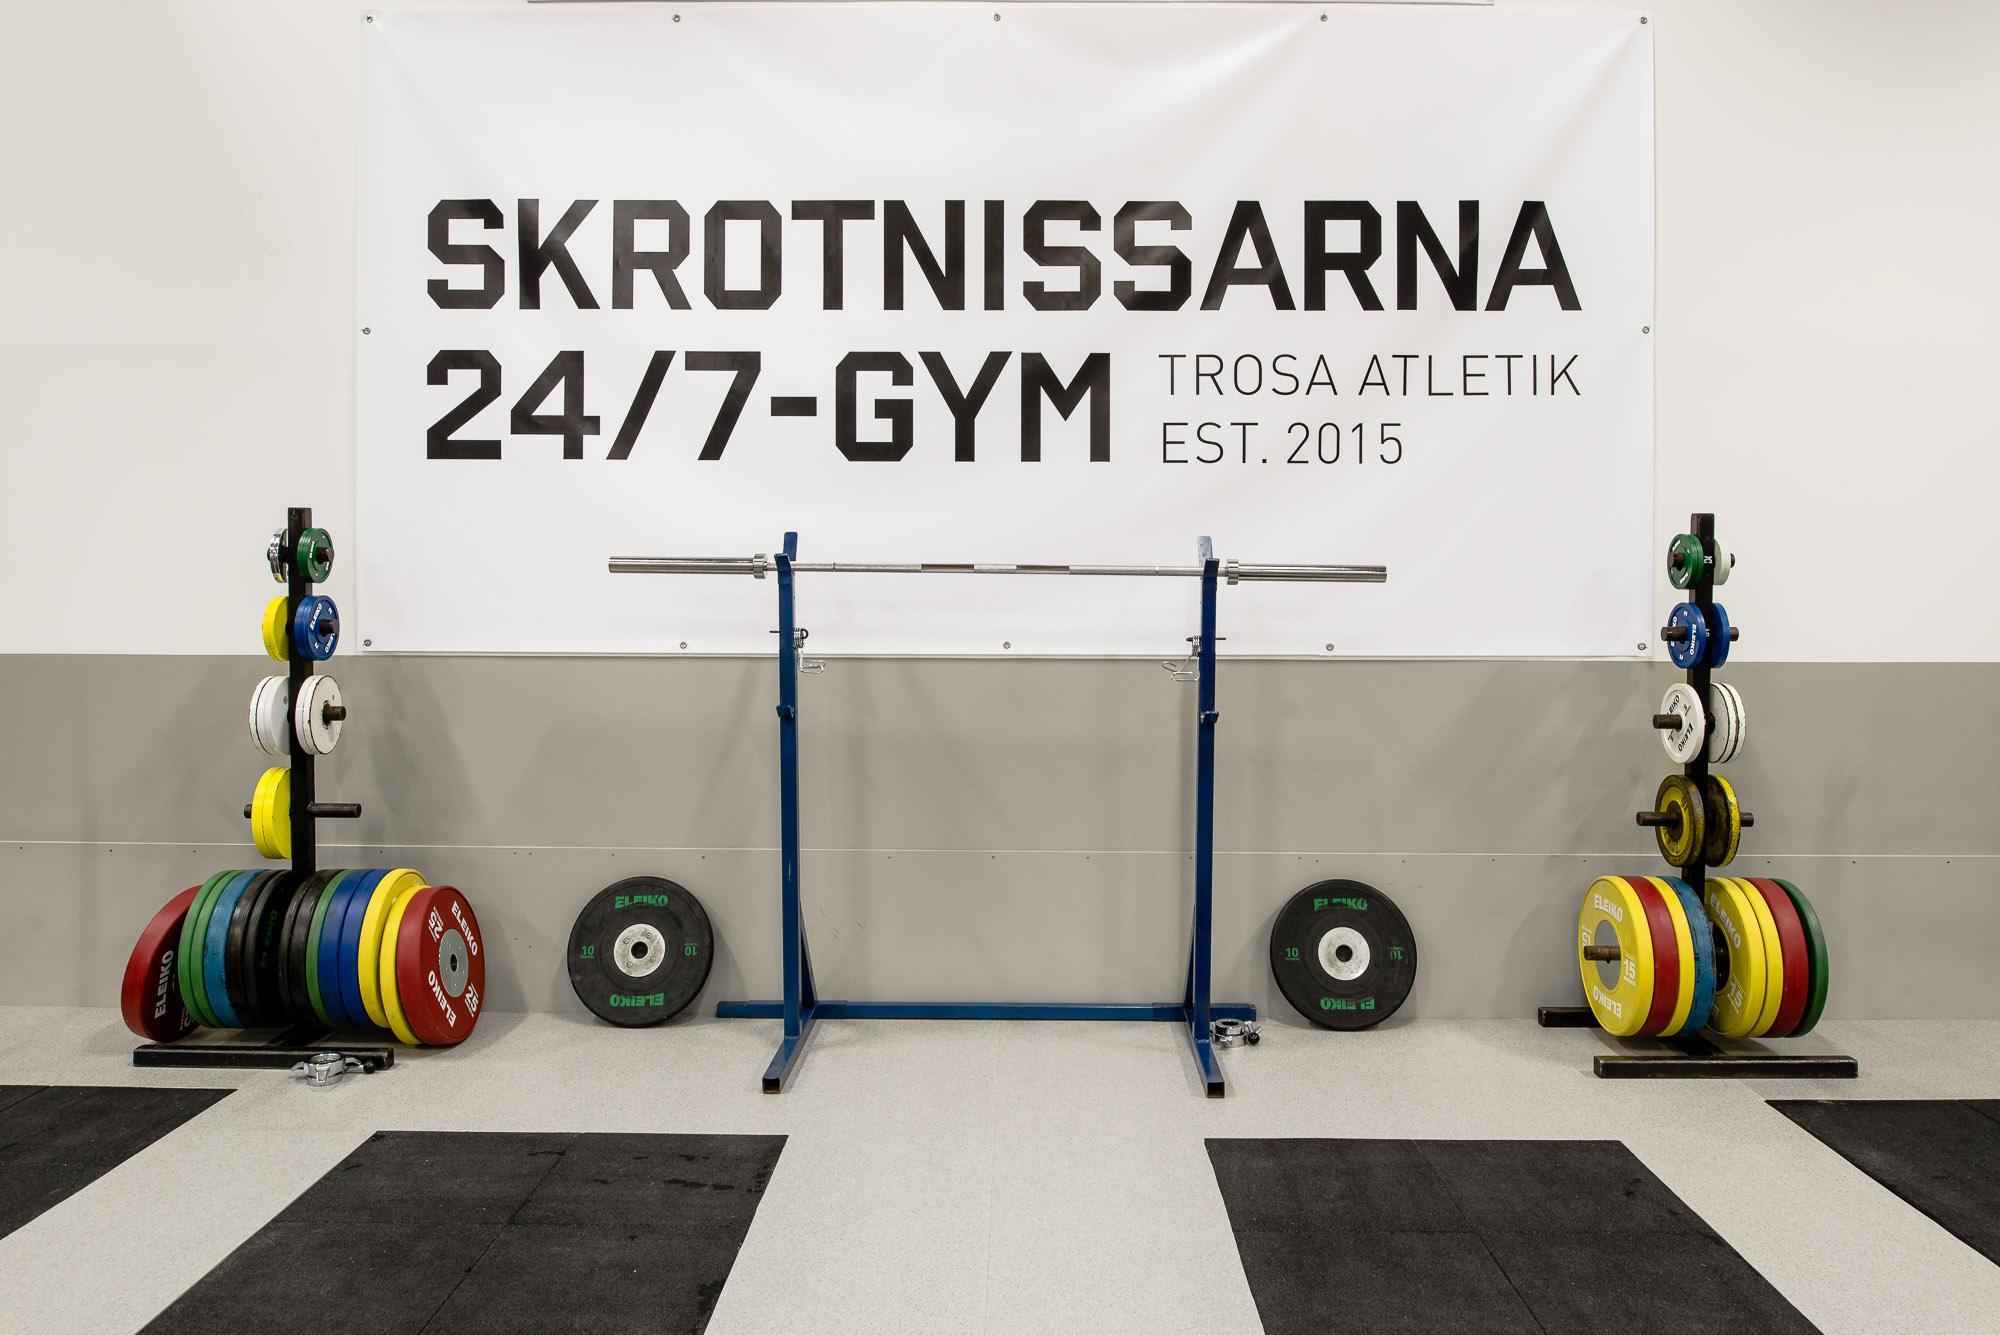 Skrotnissarna, 24/7-Gym, Trosa